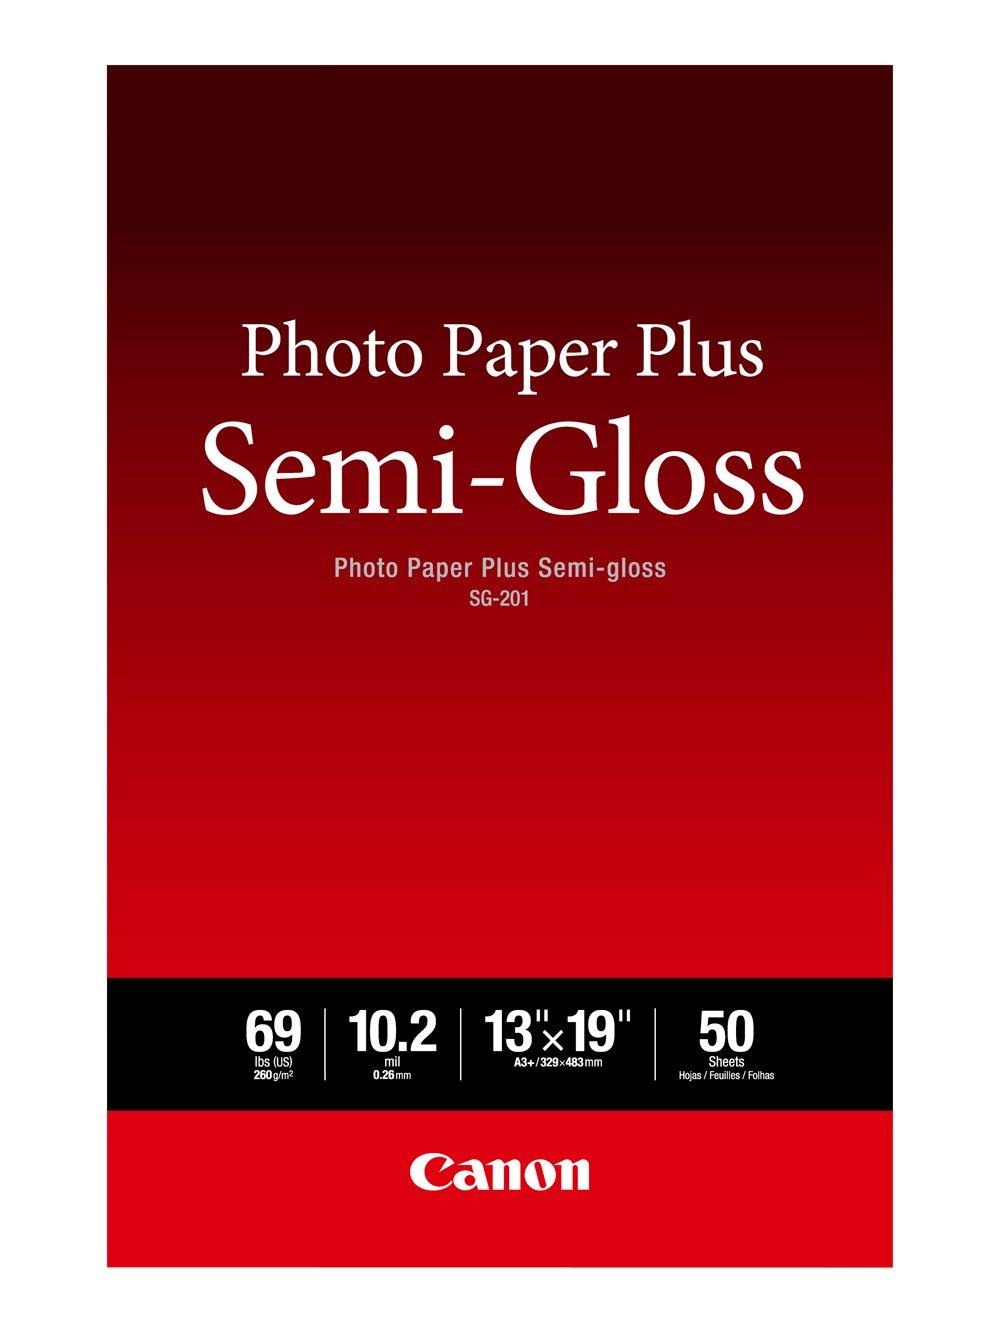 Canon SG-201 13X19(50)  Photo Paper Plus Semi-Gloss 13'' x 19'' (50 Sheets) (SG-201 13X19)